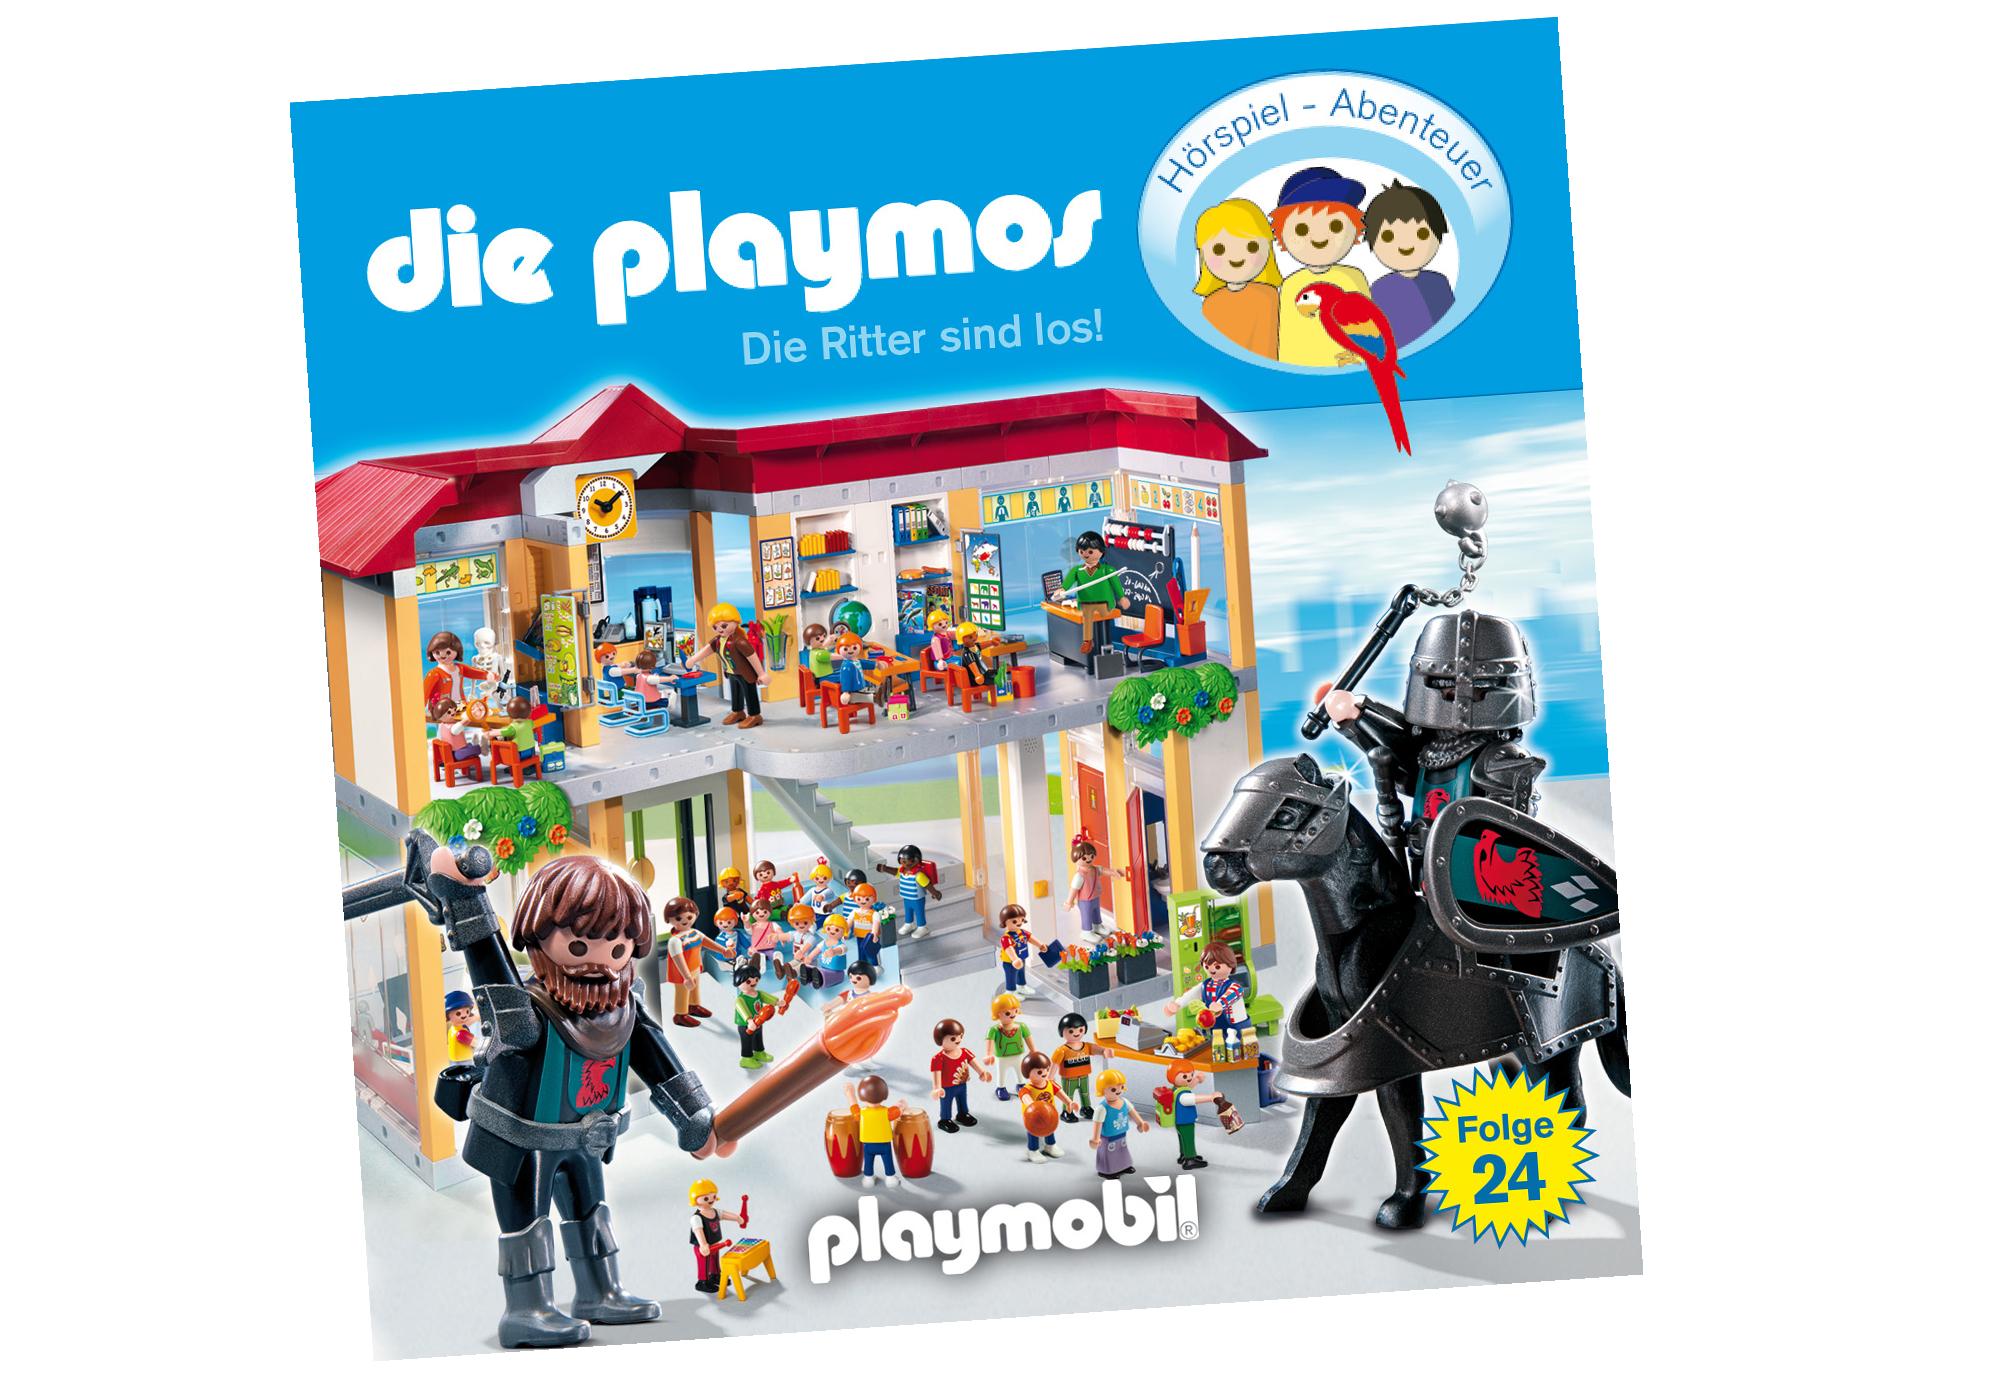 http://media.playmobil.com/i/playmobil/80330_product_detail